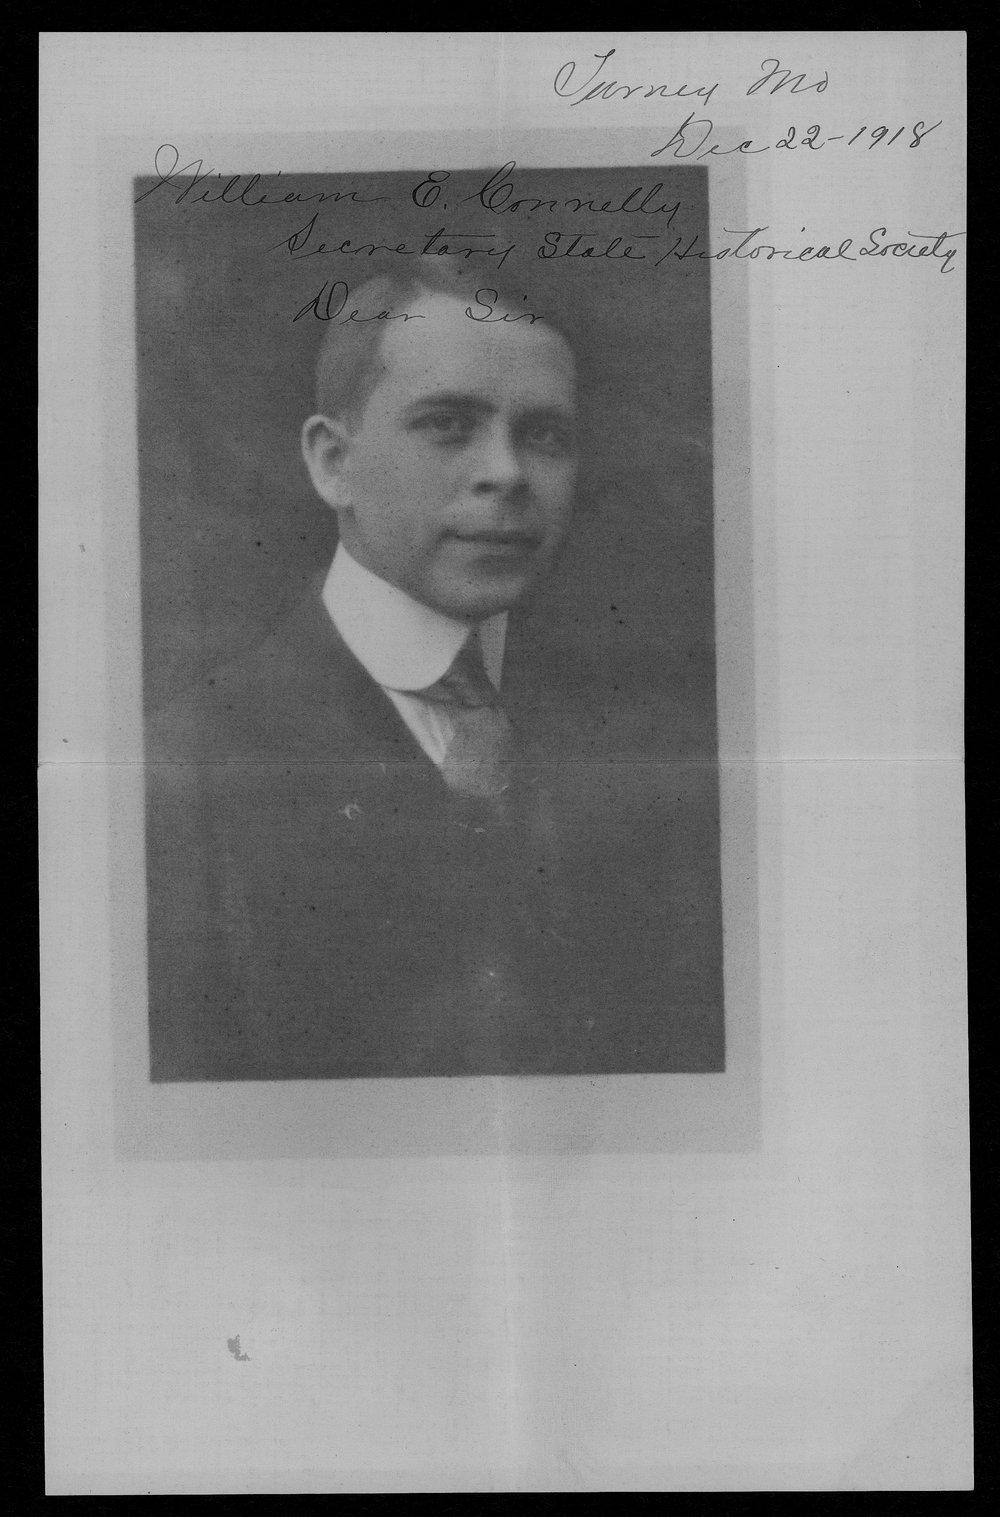 Richard E. Scruggs, World War I soldier - 4